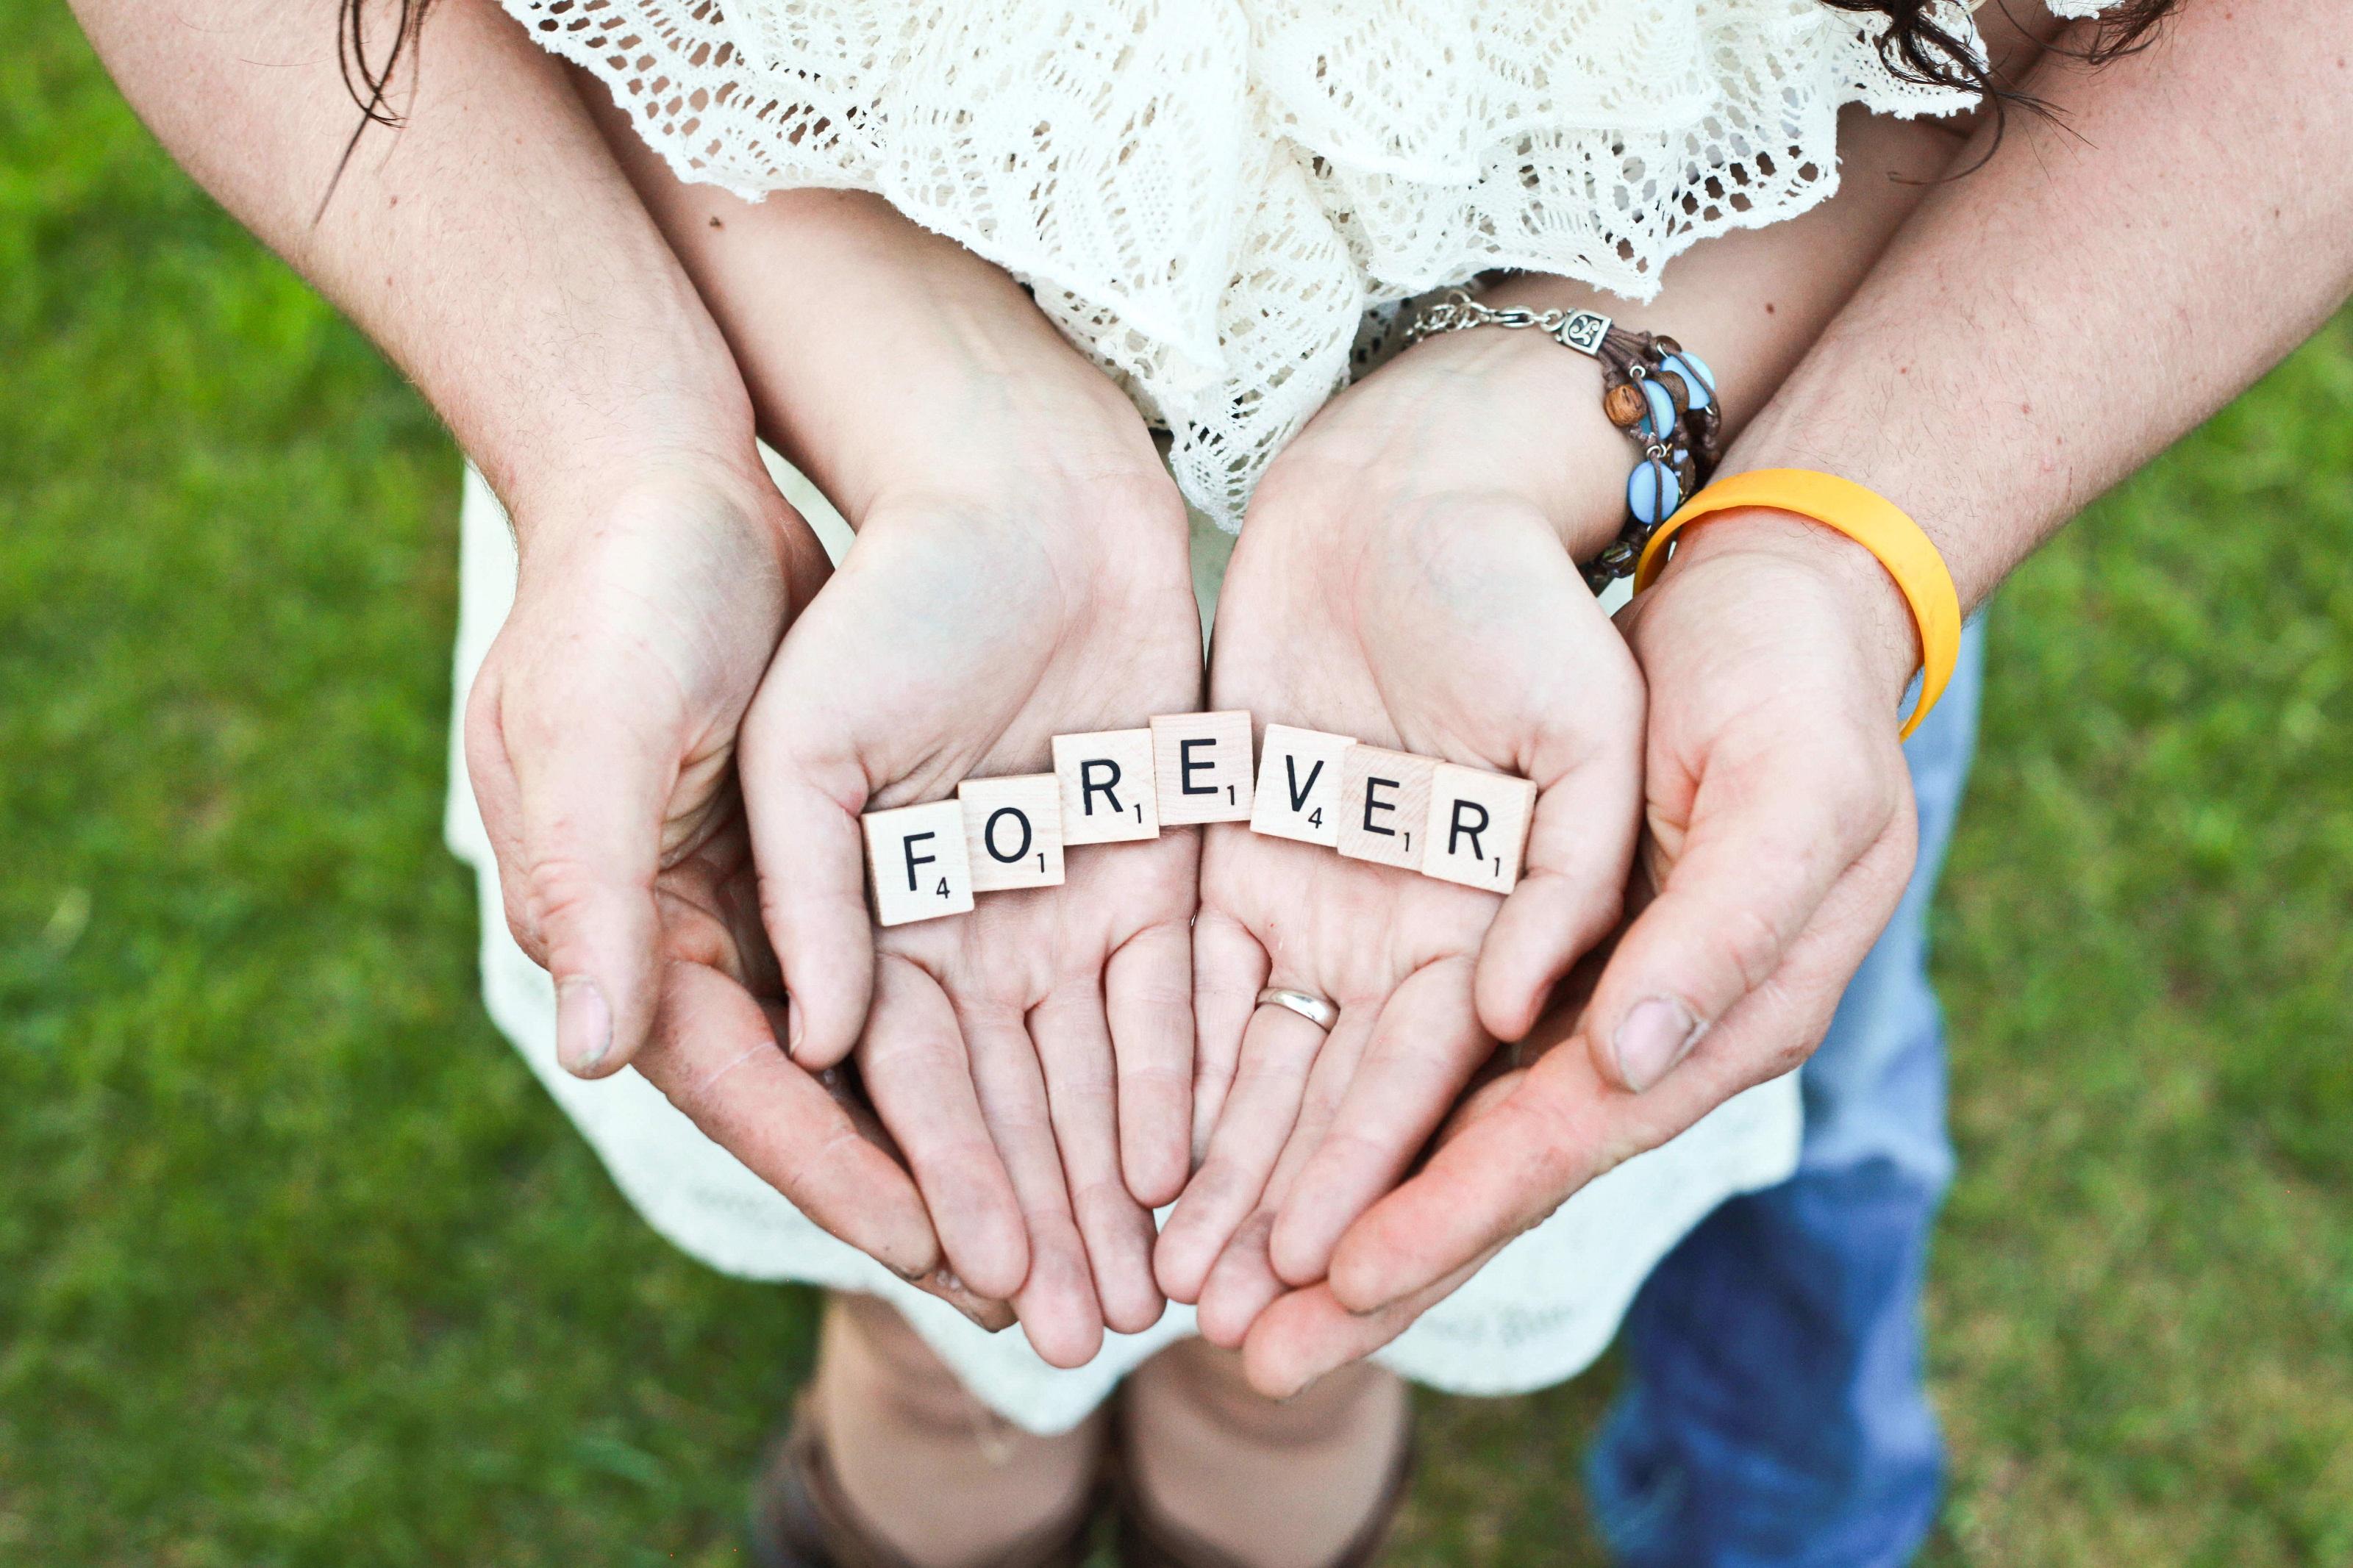 Friends Forever WallPaper - Best Wallpaper Collection